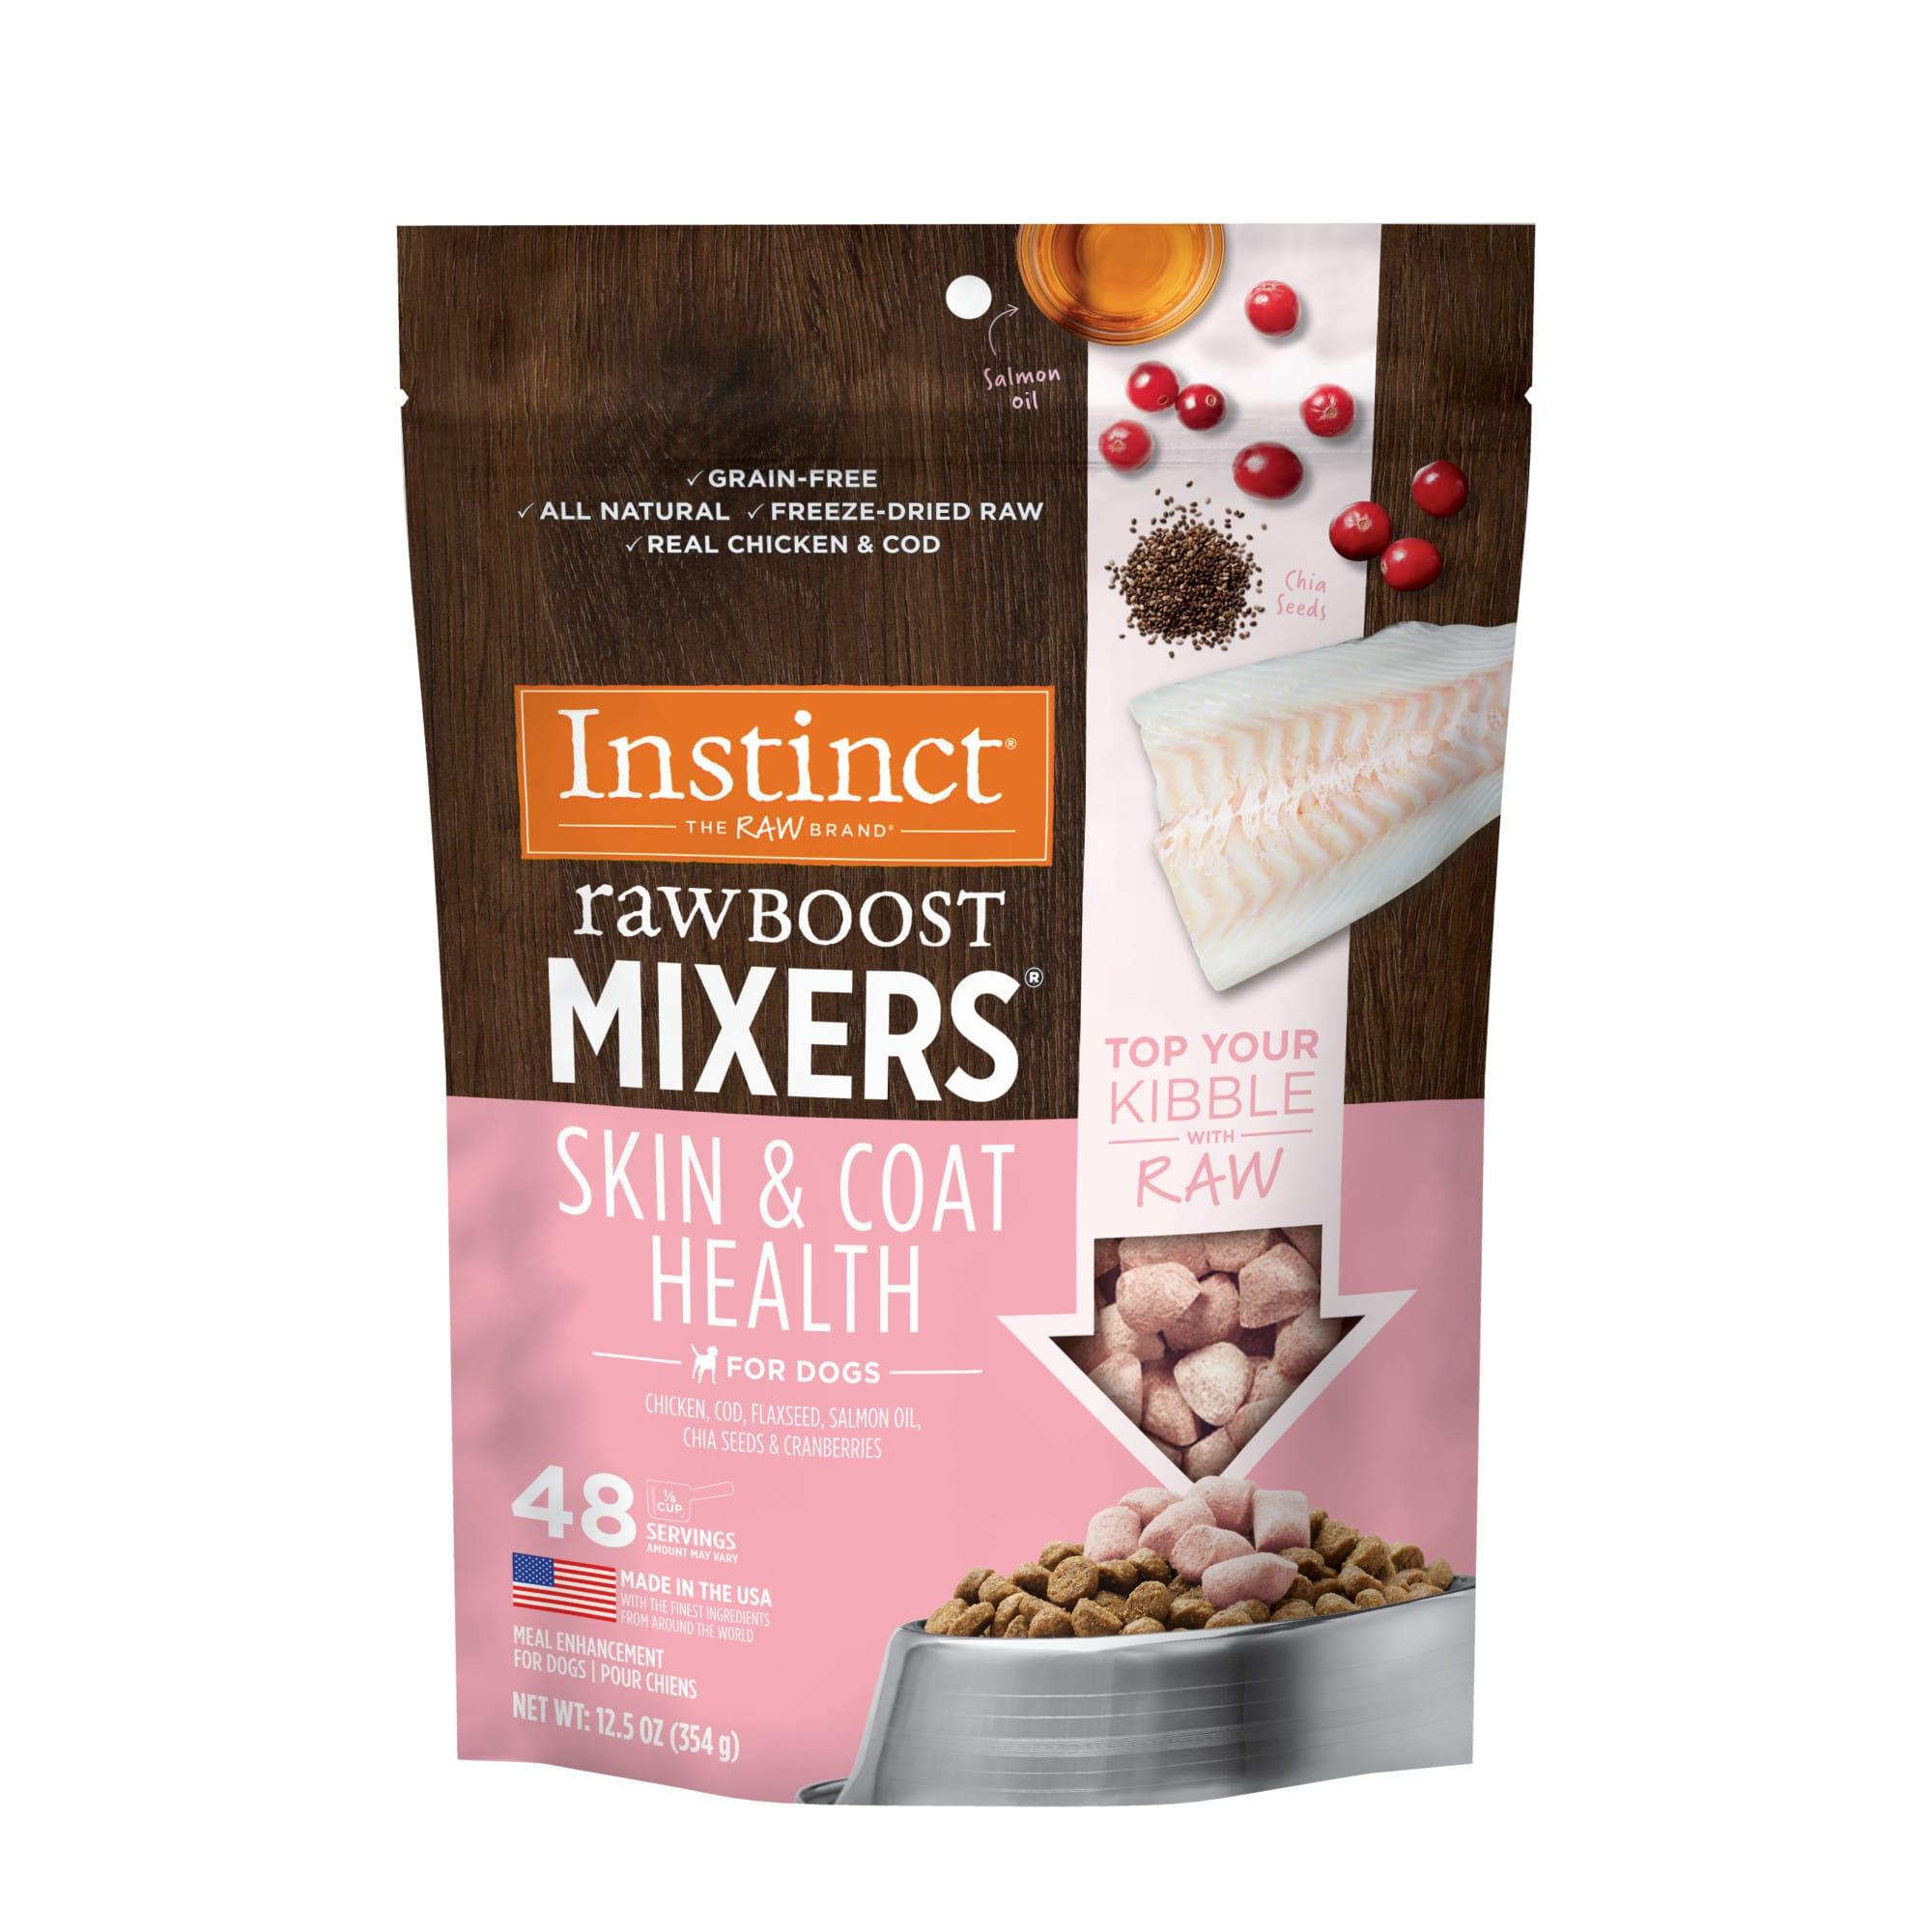 Instinct rawboost mixers for skin & coat